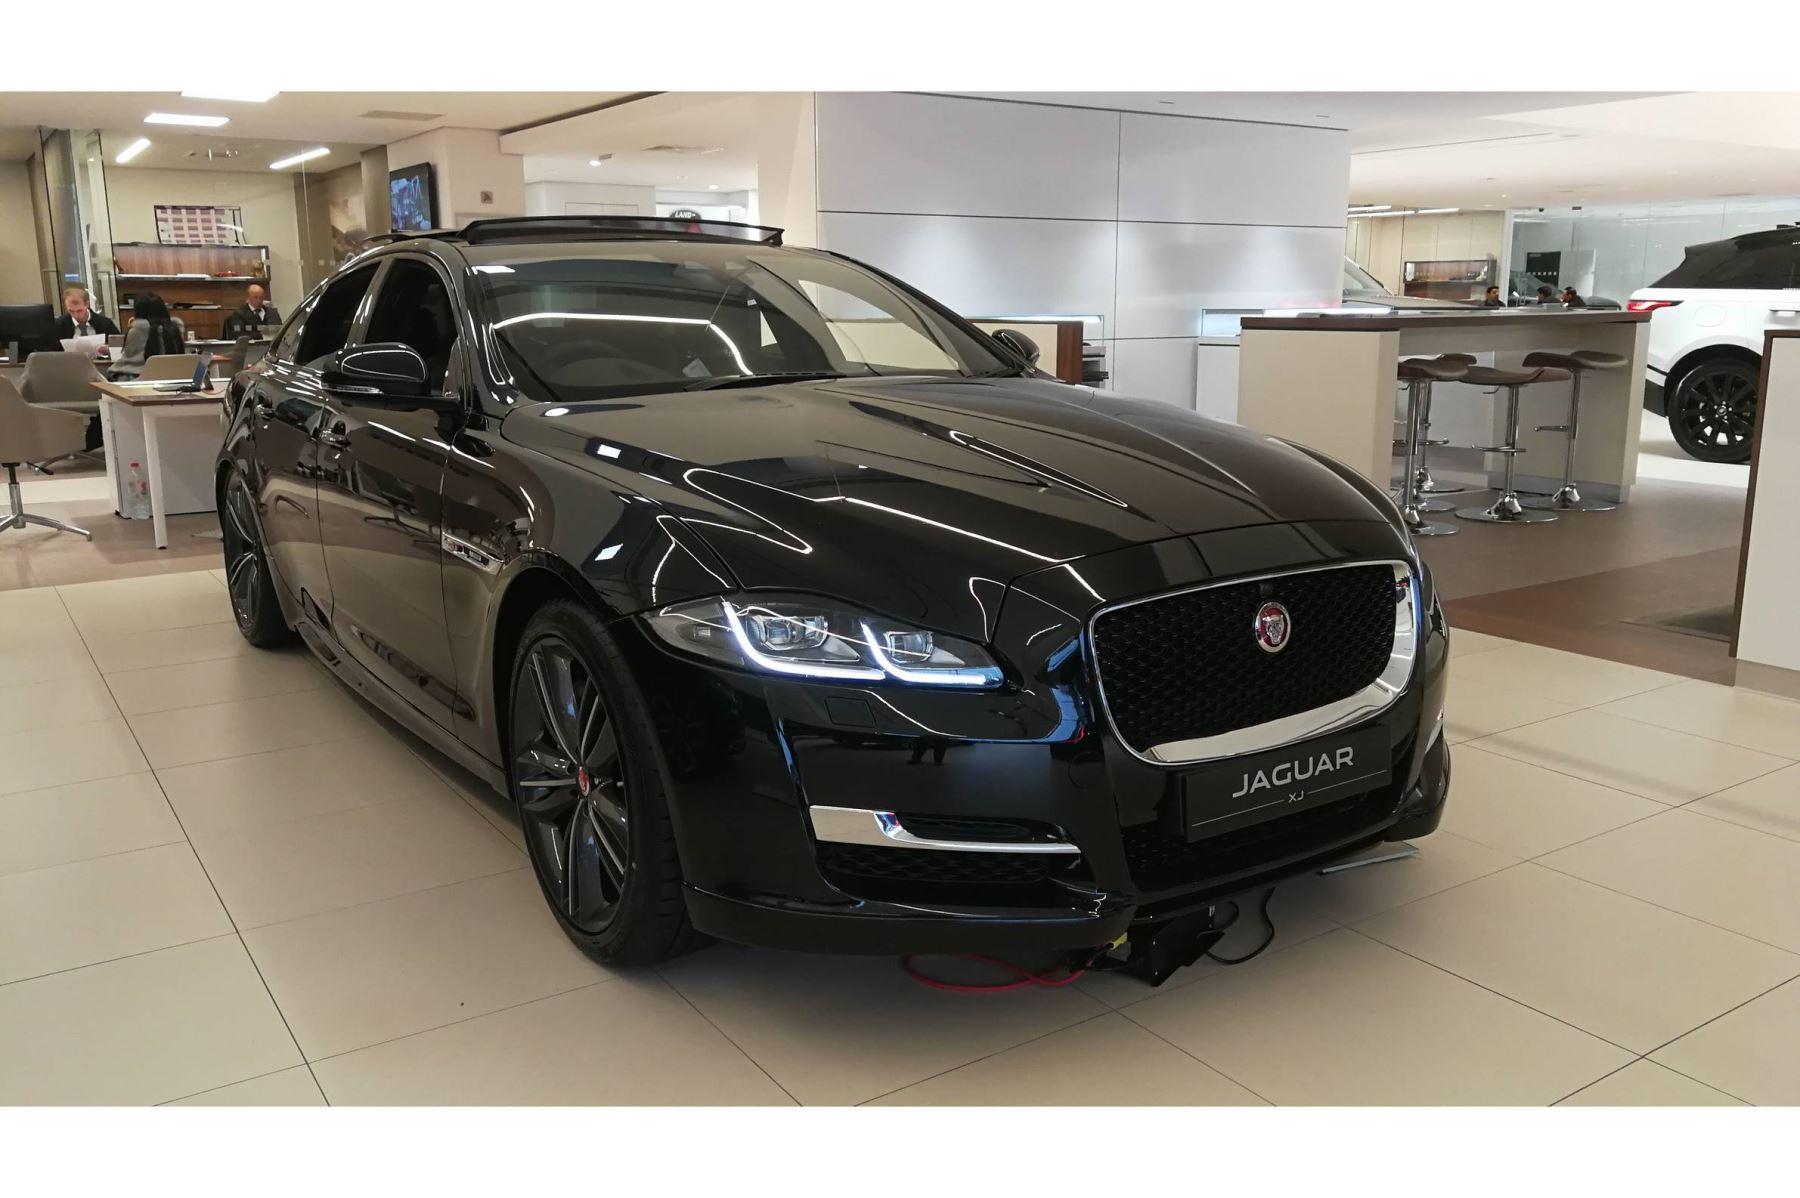 Jaguar XJ 3.0d V6 R-Sport Diesel Automatic 4 door Saloon (2018) image